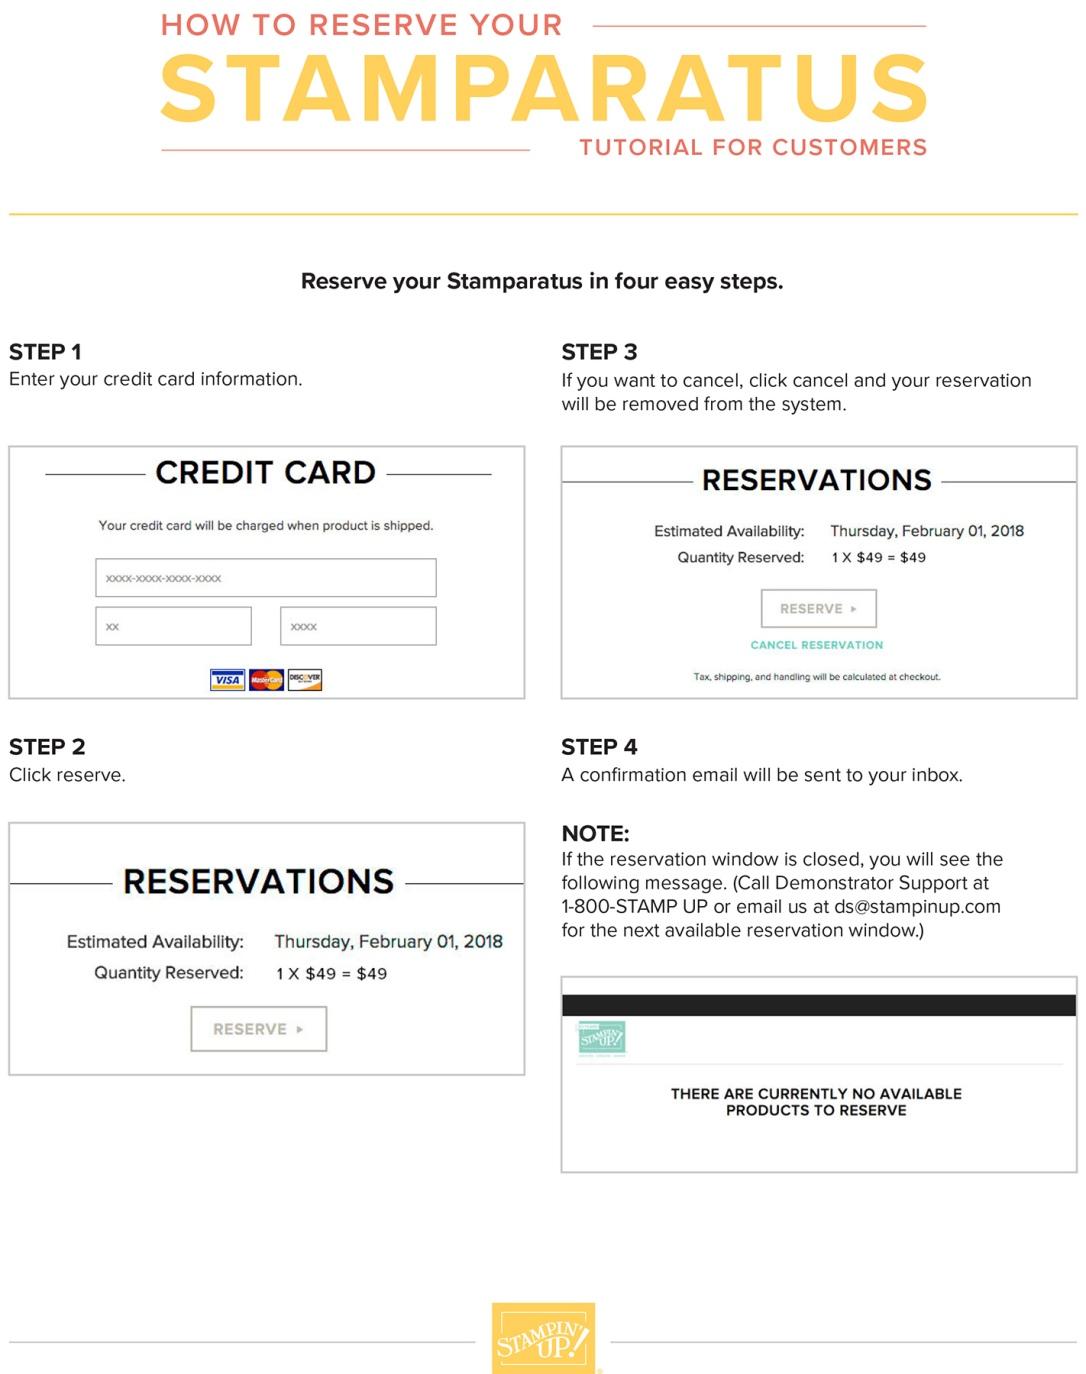 US_Stamparatus_Customer_Reservation_Tutorial